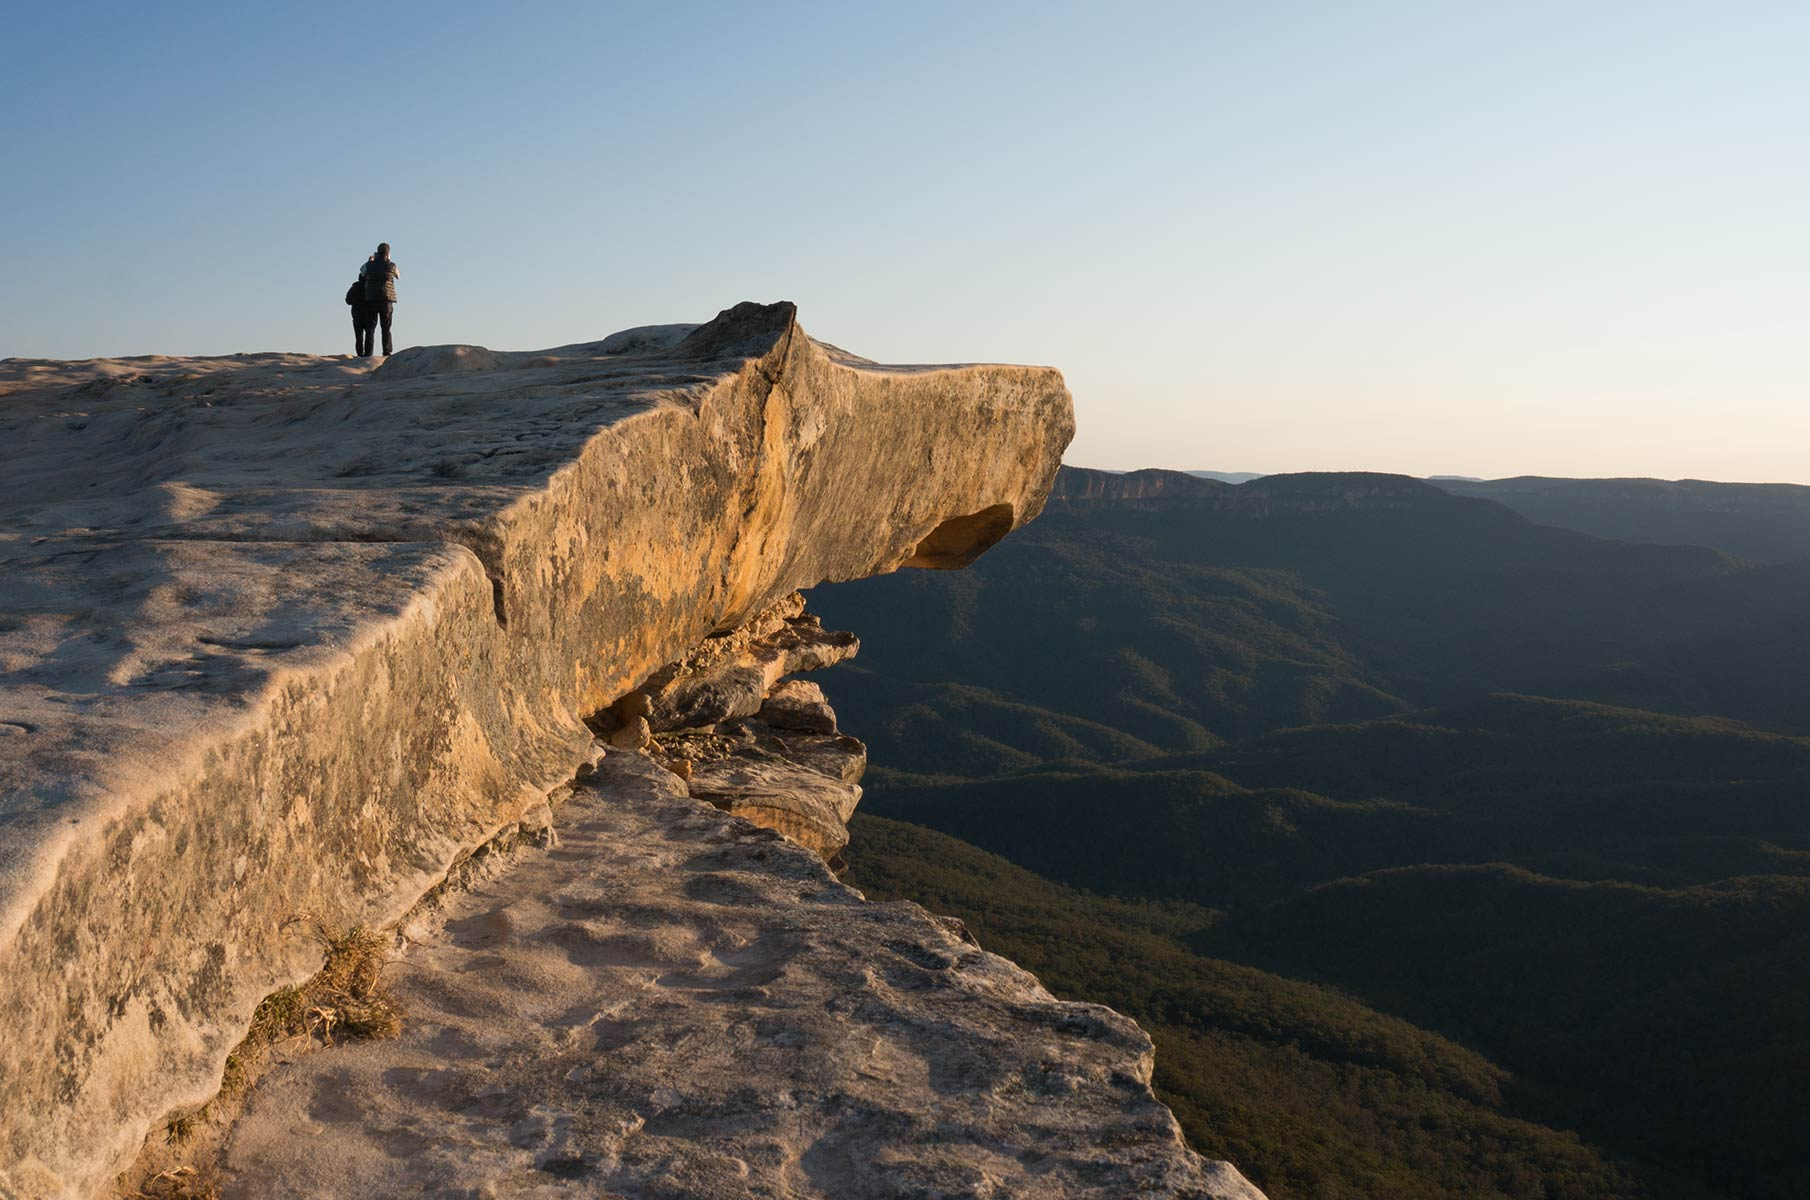 Lincoln's Rock im Blue Mountains Nationalpark, Australien